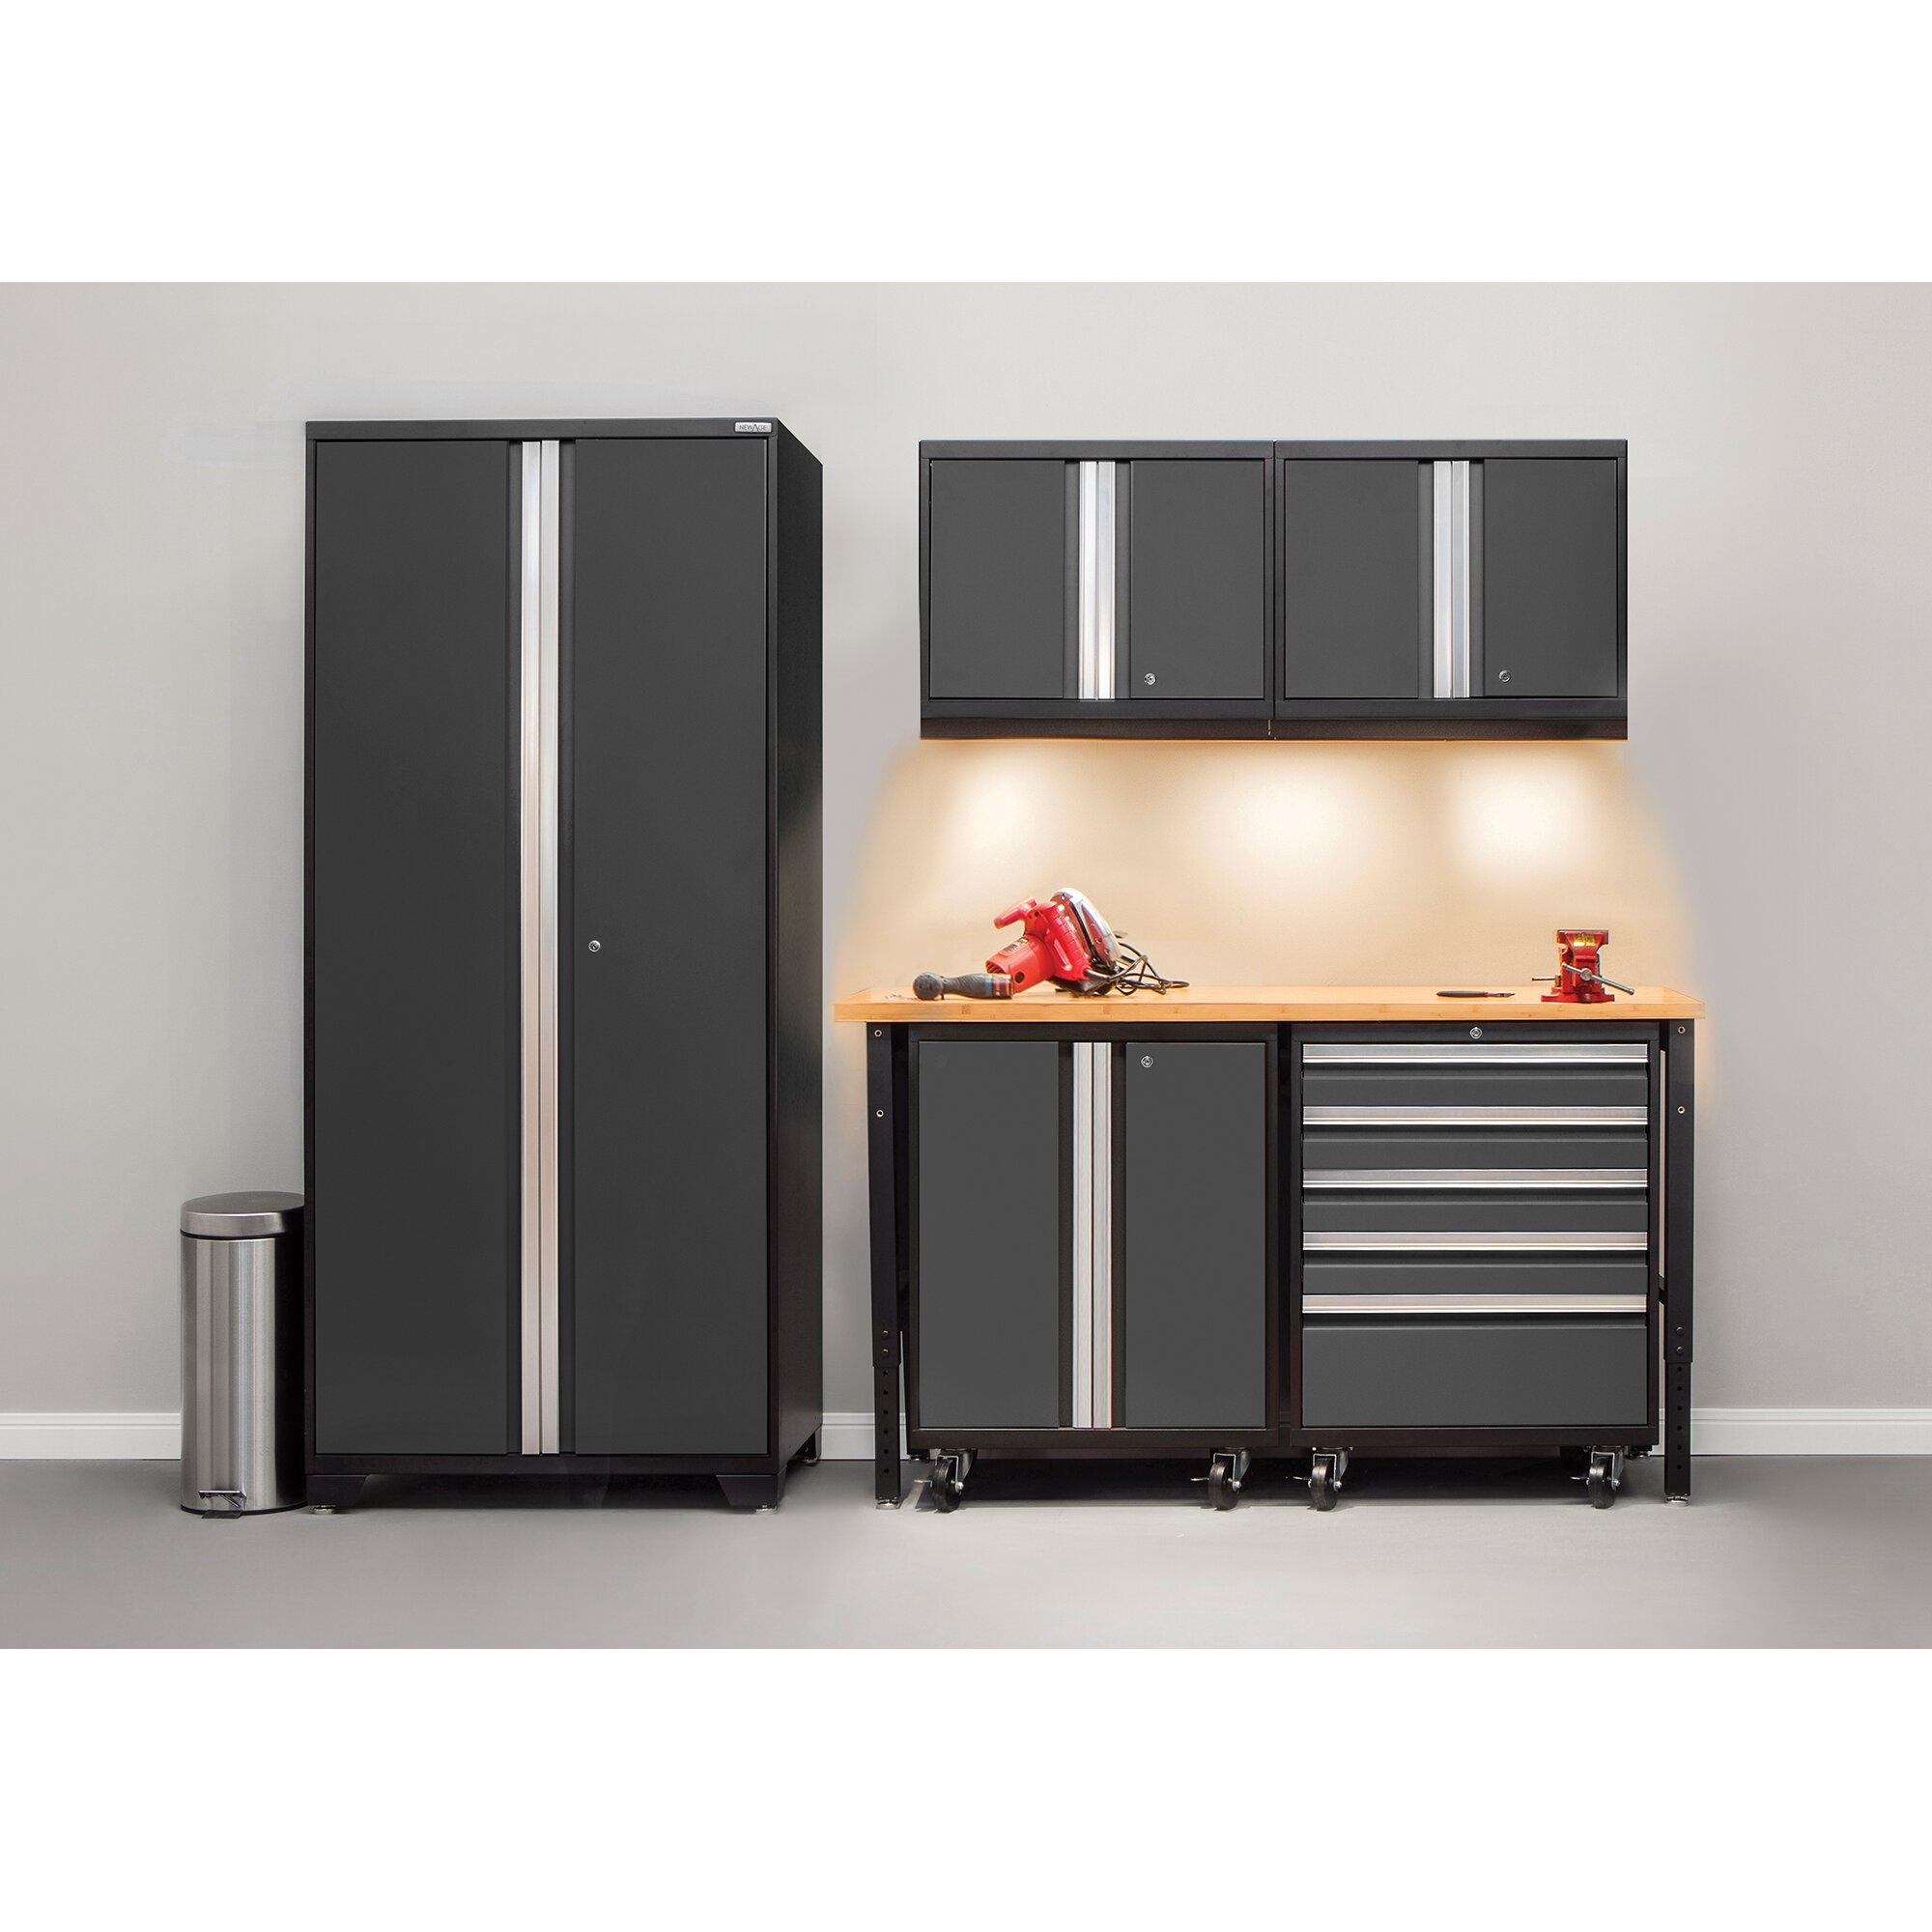 Economical Two Car Garage With Storage: NewAge Products Pro 3.0 Series 6-Piece Garage Storage